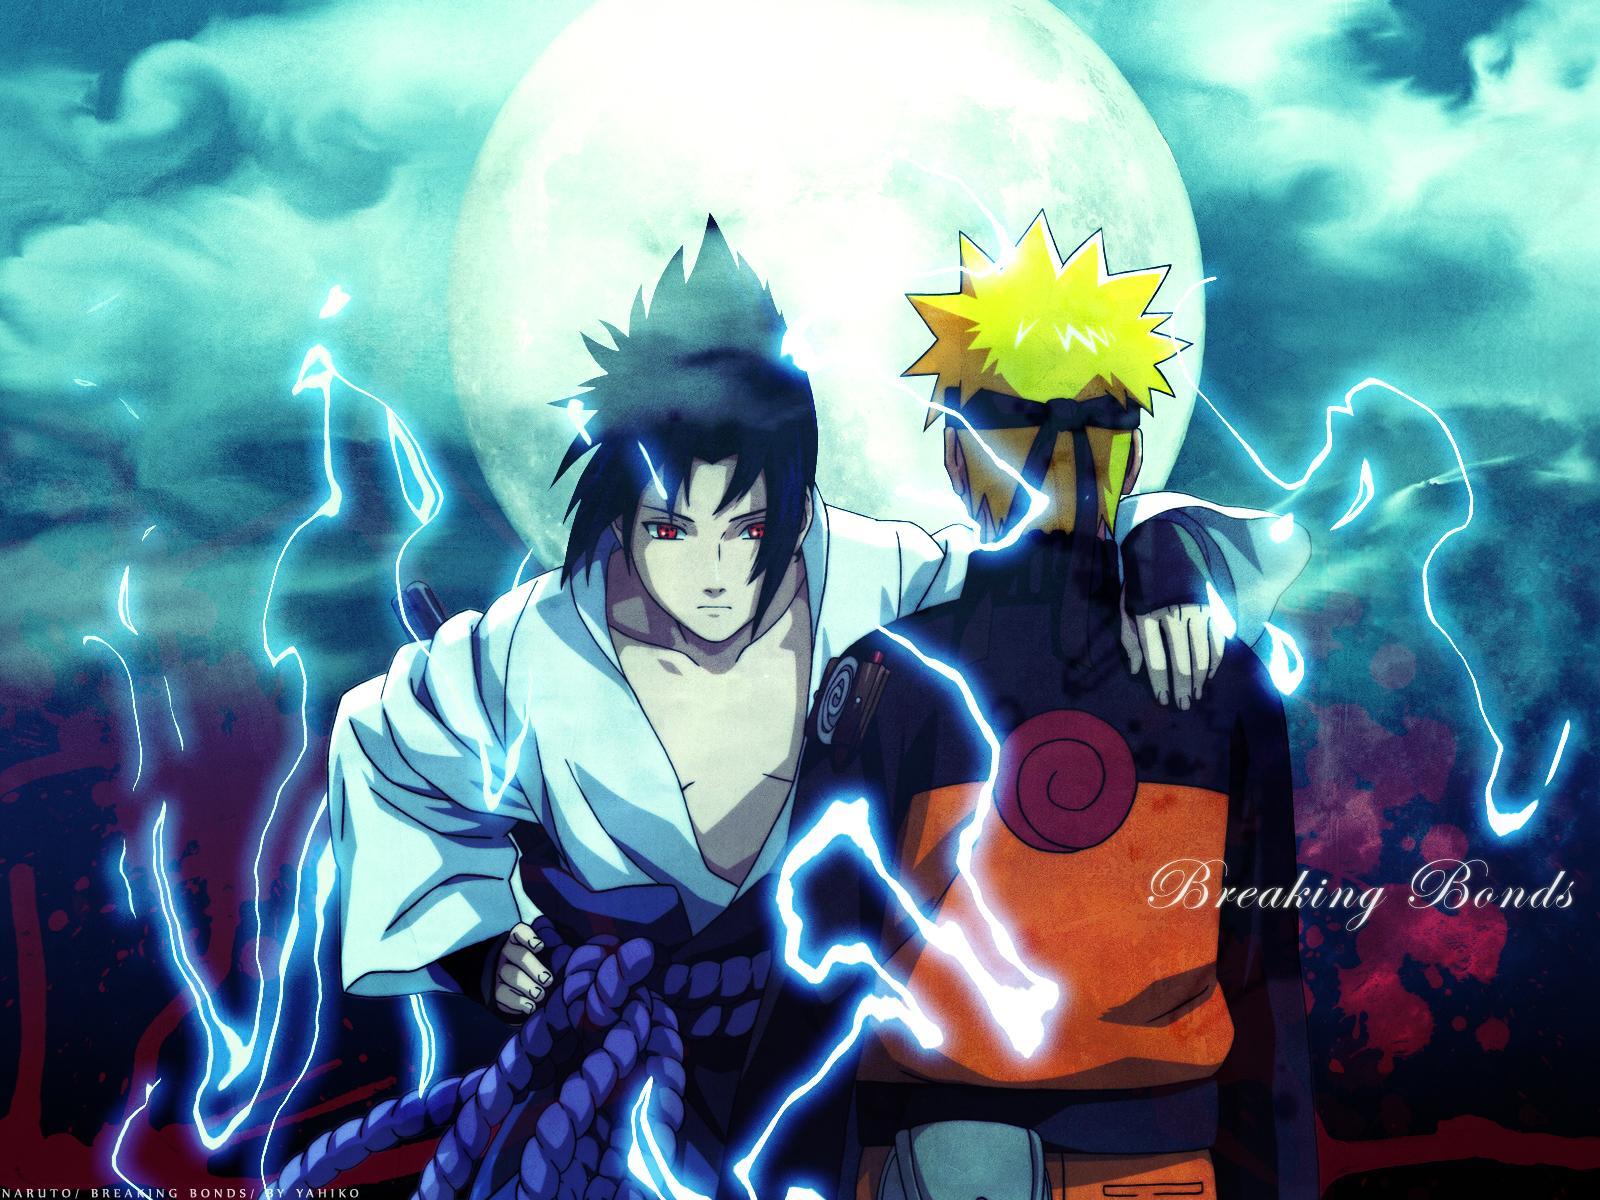 http://4.bp.blogspot.com/-XkvqB-zhfO4/T6A1p20bUzI/AAAAAAAACEE/W7wuiZH-YHU/s1600/Naruto_and_sasuke_HD_Wallpaper_1.jpg